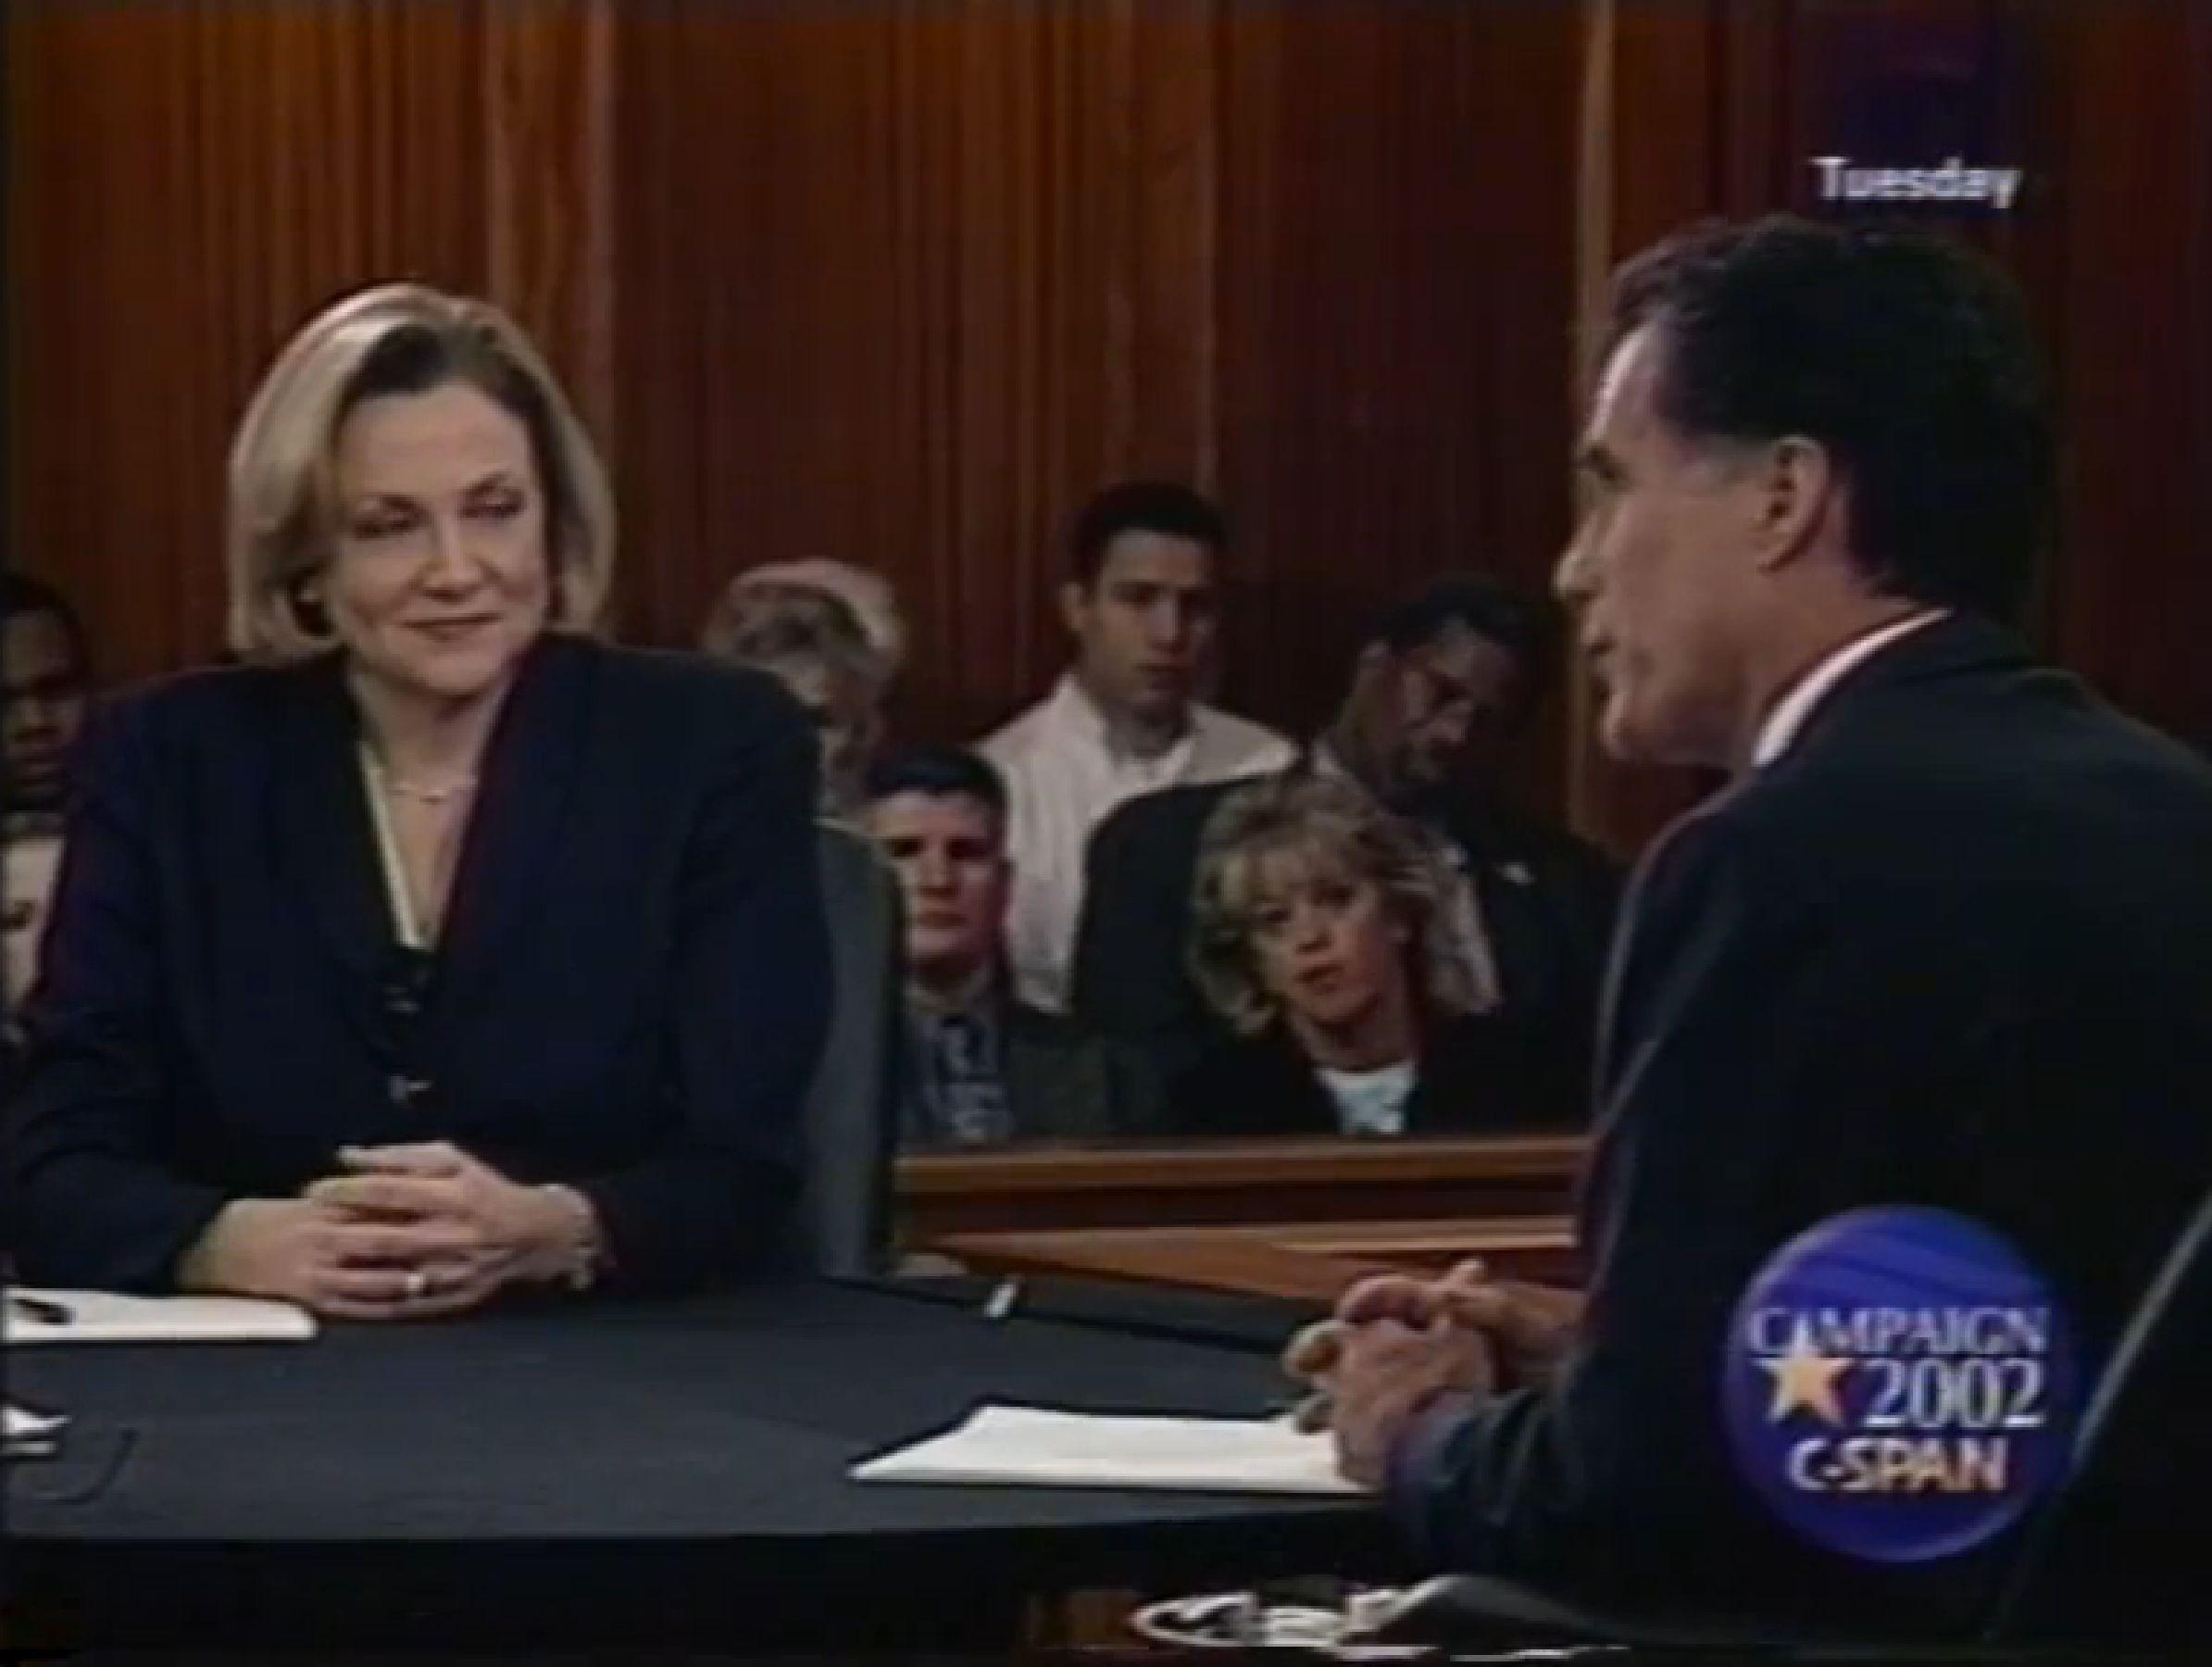 Shannon OBrien debates Mitt Romney during the 2002 Massachusetts gubernatorial campaign